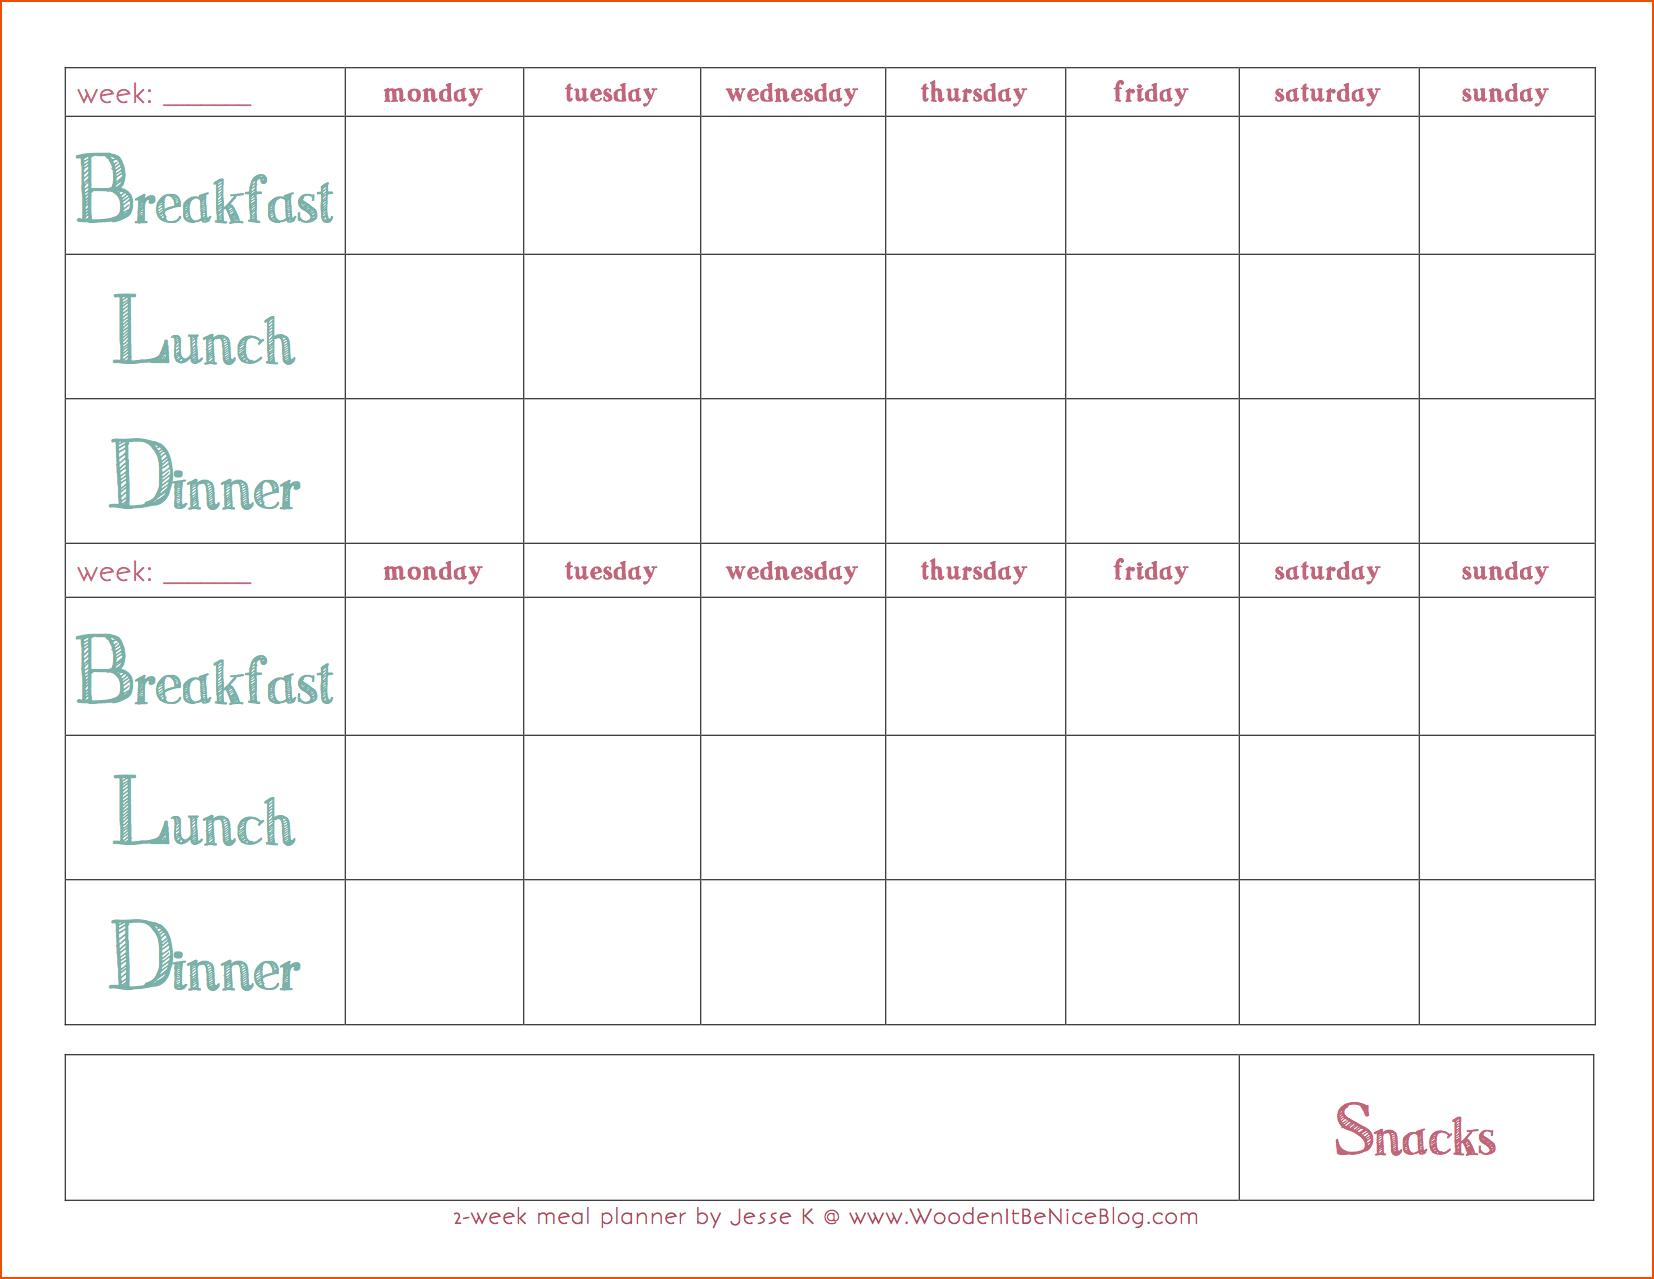 Weekly Meal Plan Template 2Weekmealplanner Coastal 5 Day Monthly Calendar Template Word